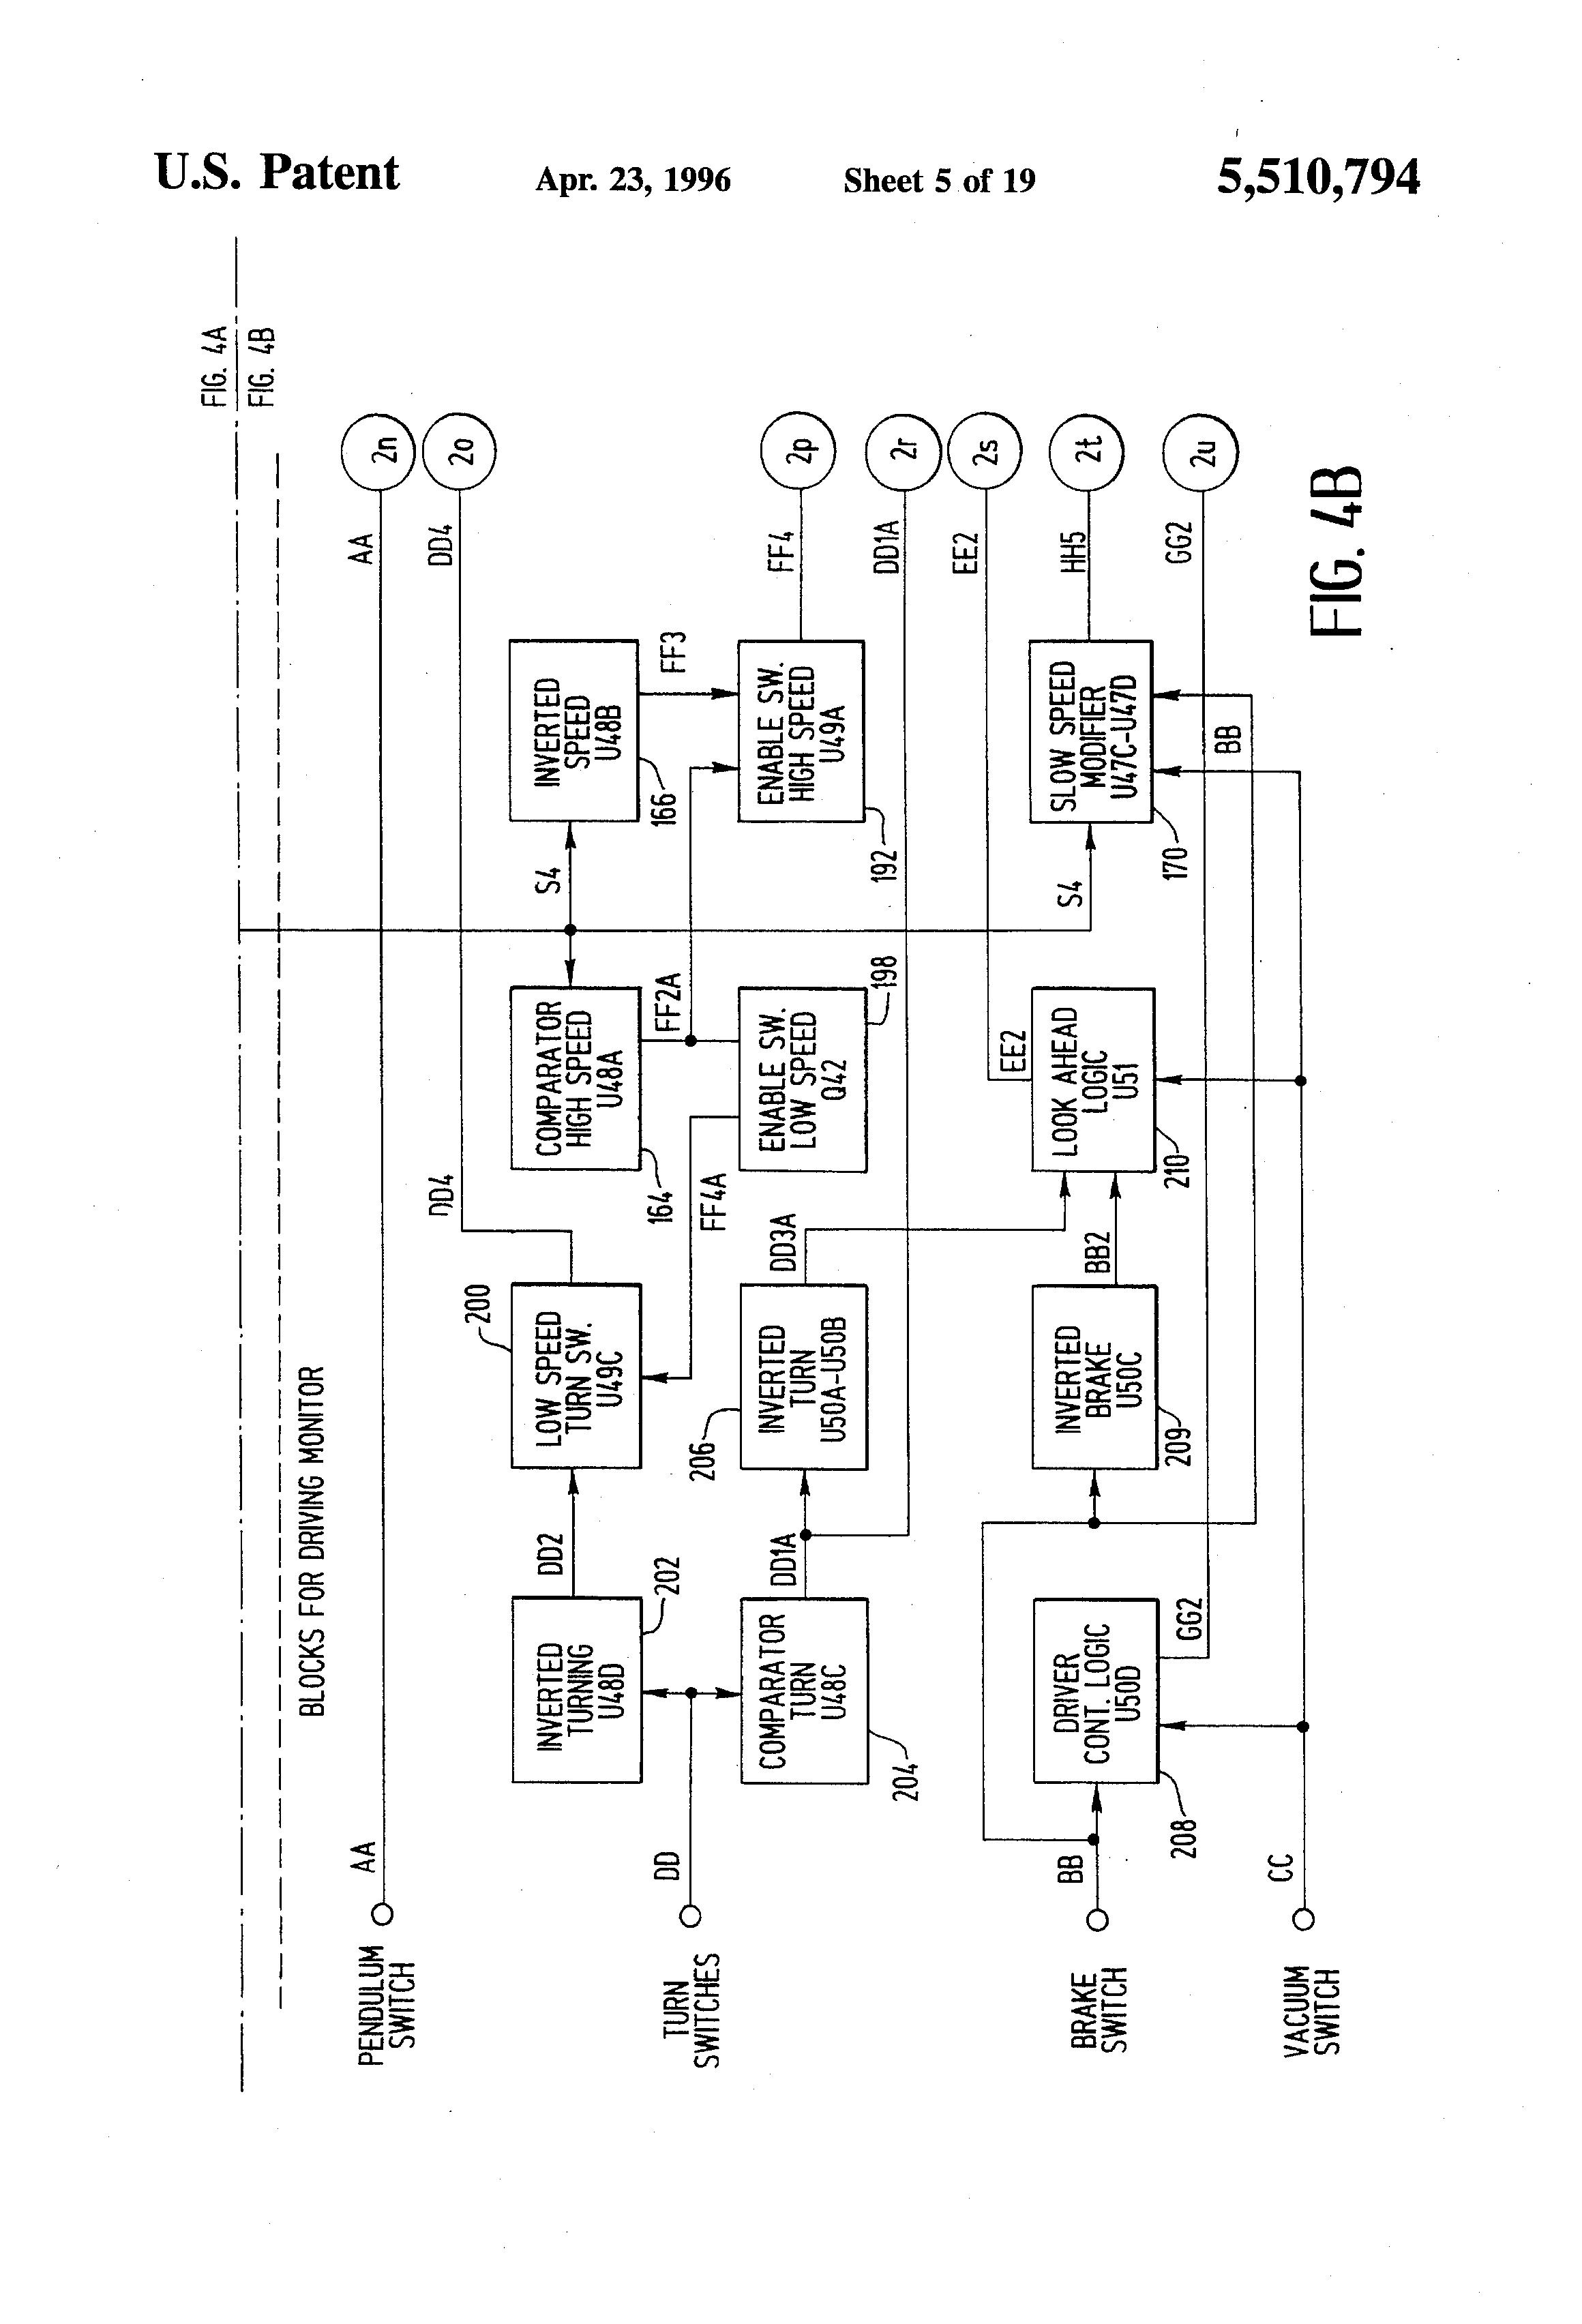 Tachometer Circuit Diagram Tradeoficcom Simple Wiring Cable Short Detector Lowfrequency Data Patent Us5510794 Vehicular Radar Wayside Transponder System